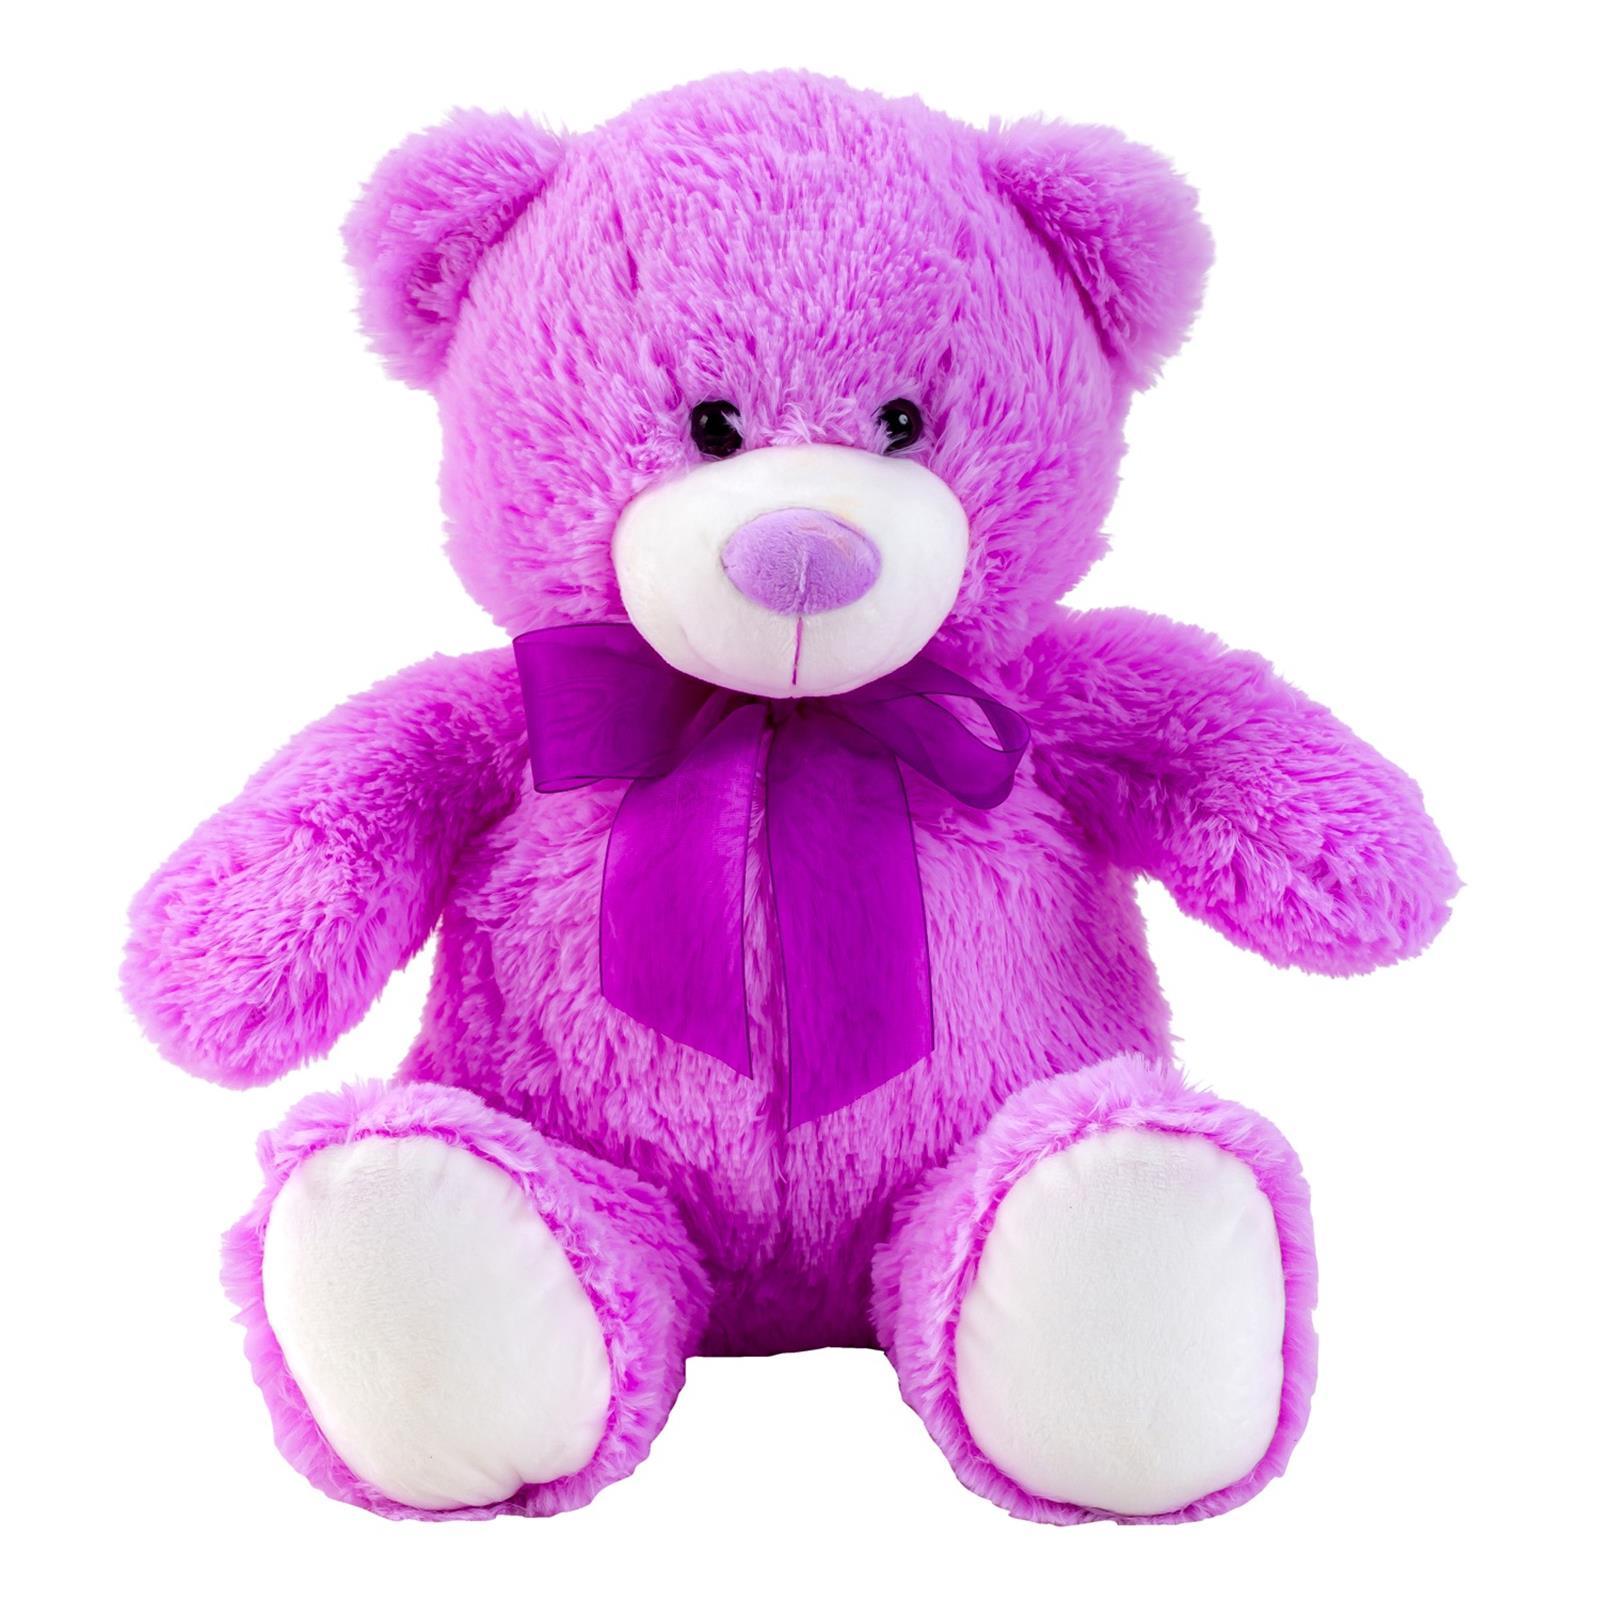 Teddybär Lila mit Schleife